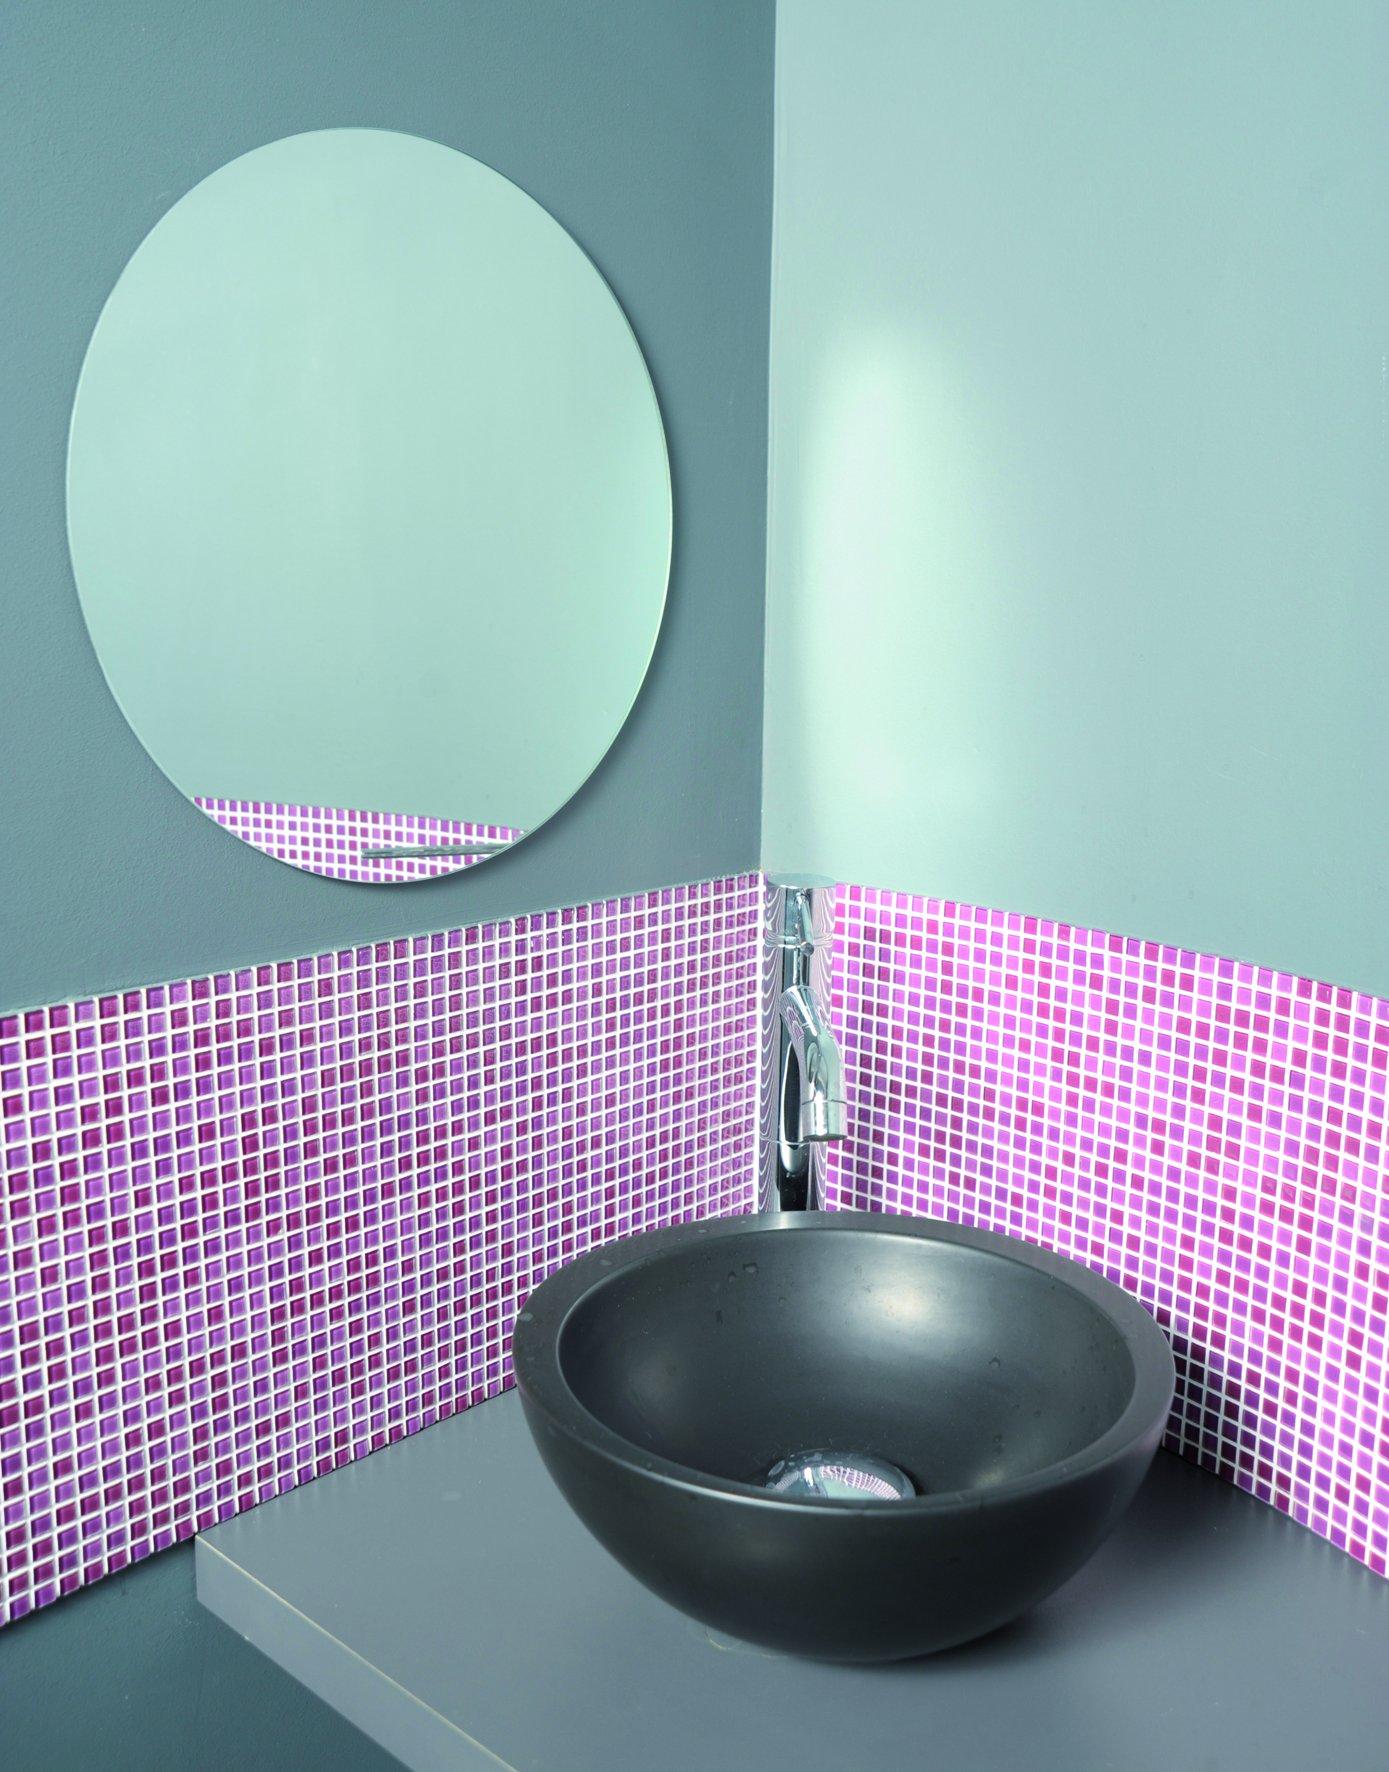 EVIDECO 851599 Self-Adhesive Round Mirror Diameter 15.7-Inch